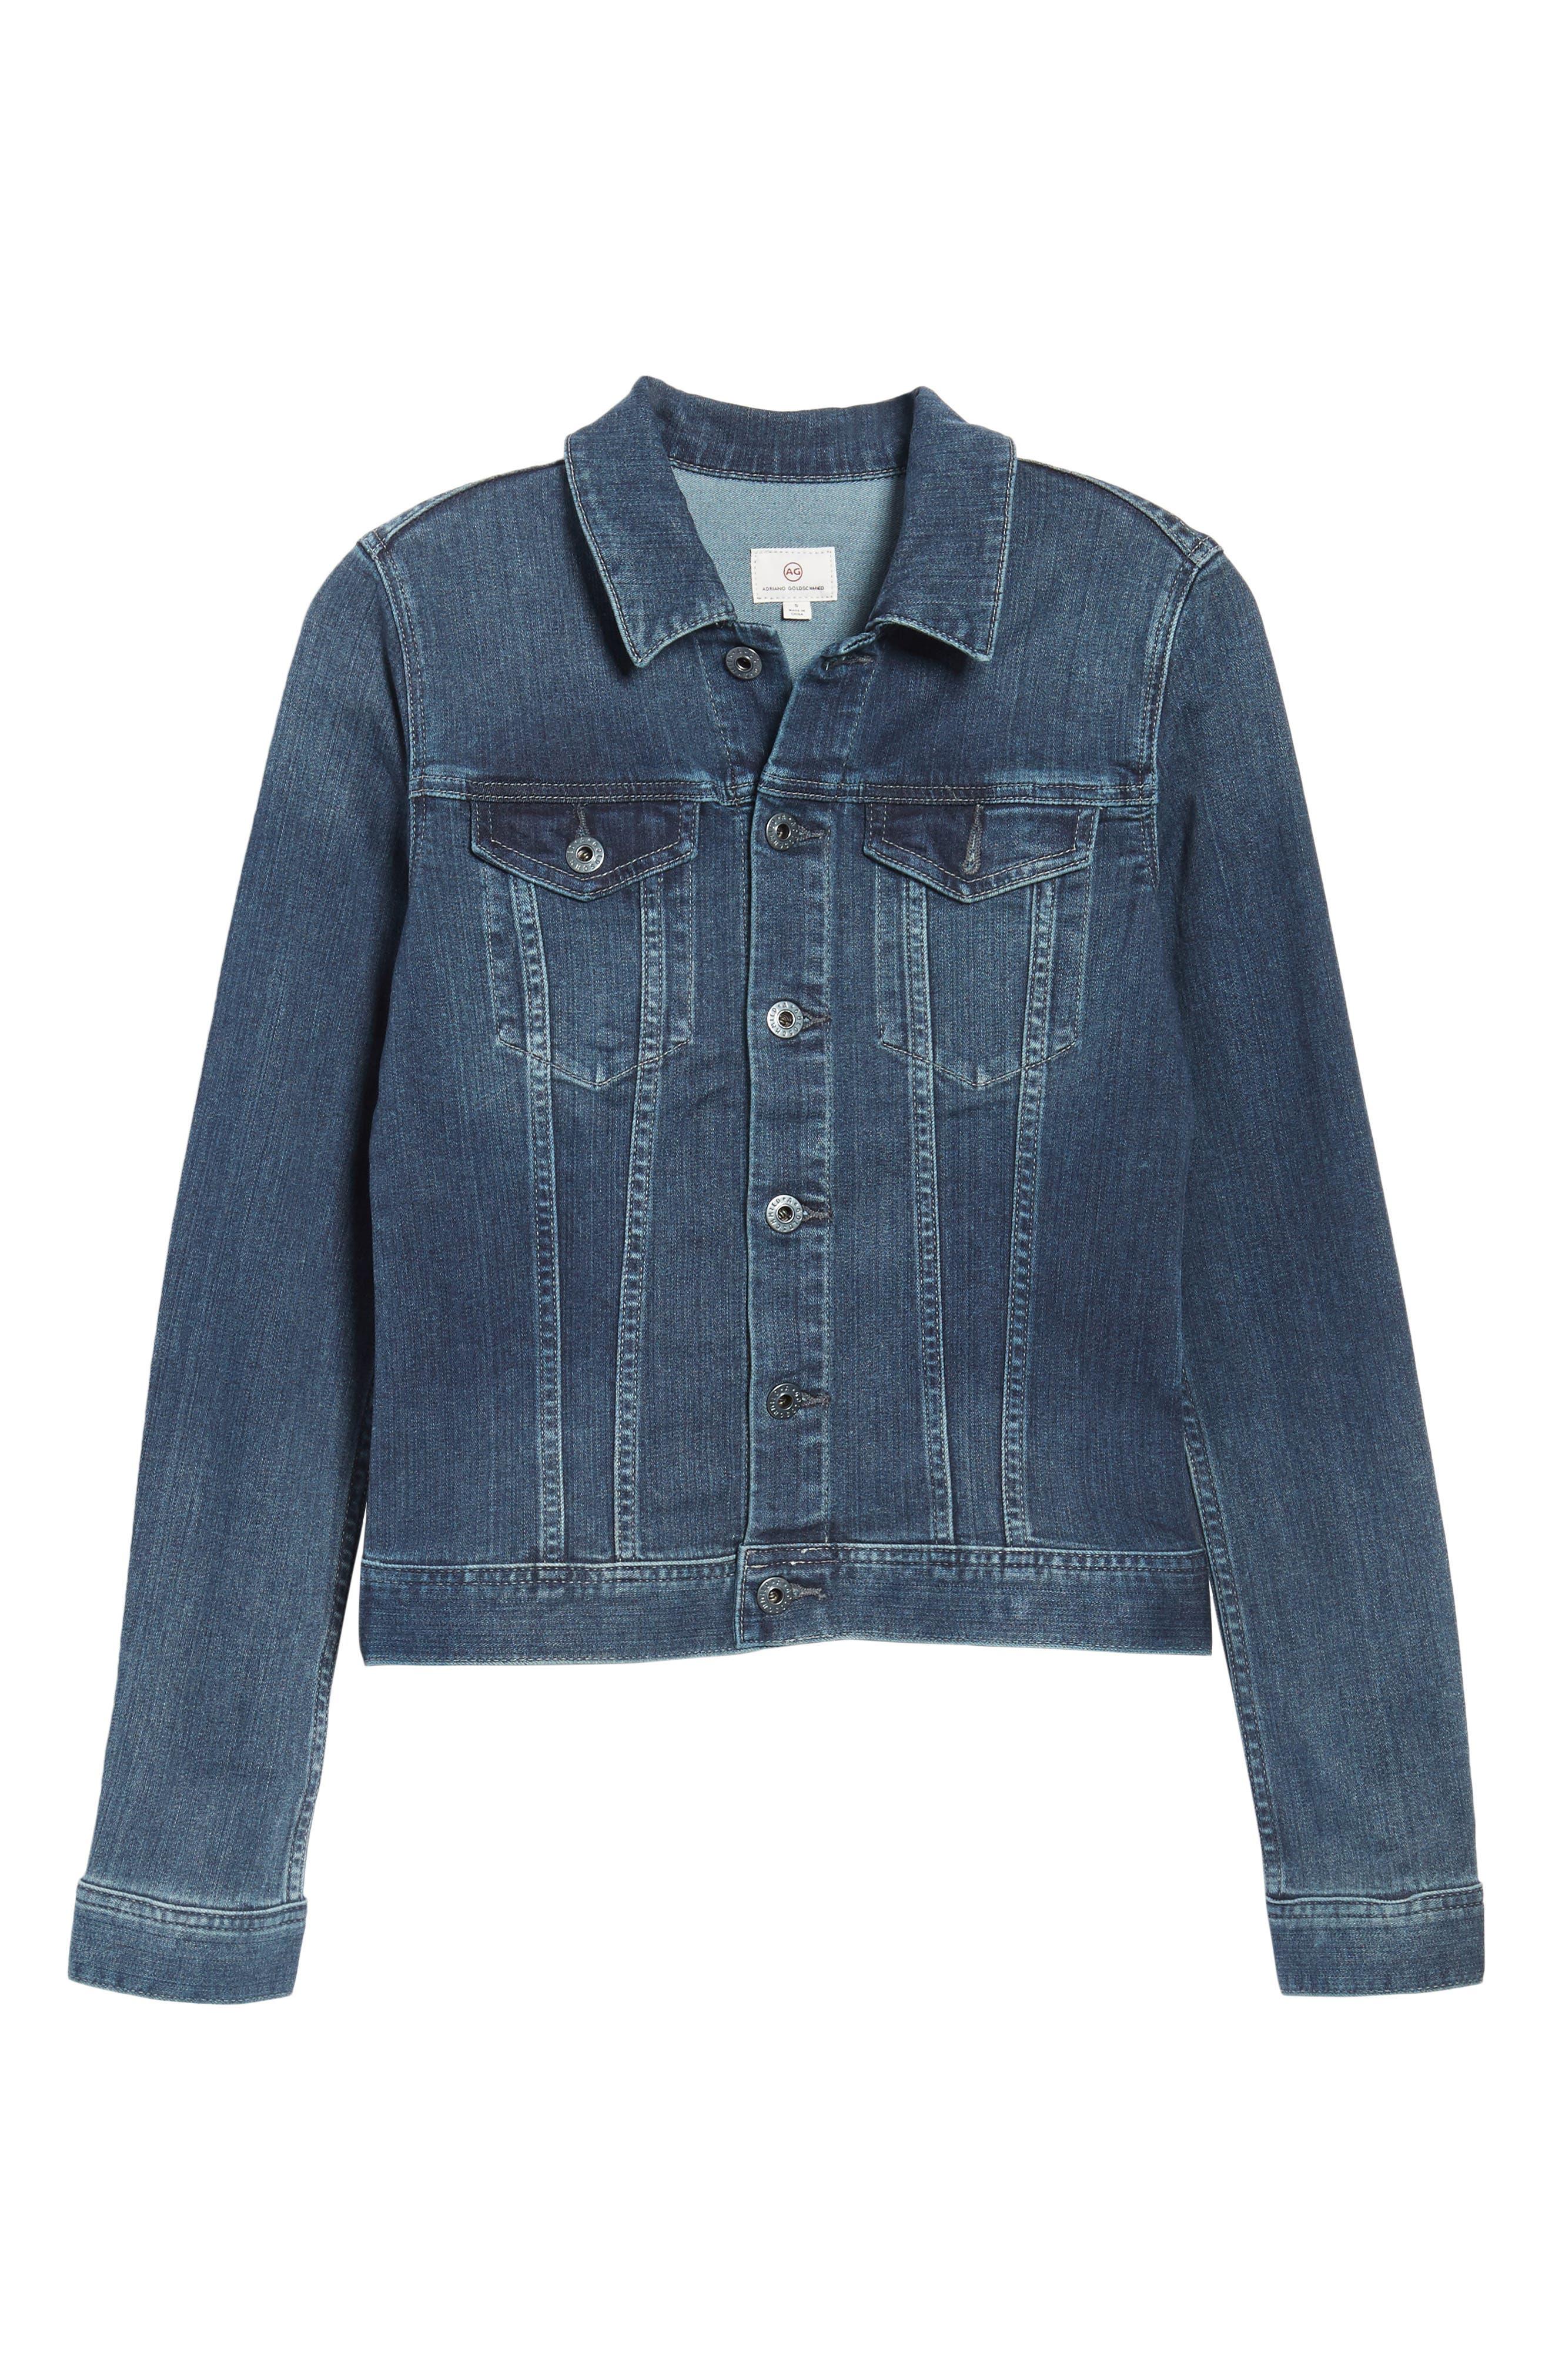 'Robyn' Denim Jacket,                             Alternate thumbnail 6, color,                             BLUE COVE